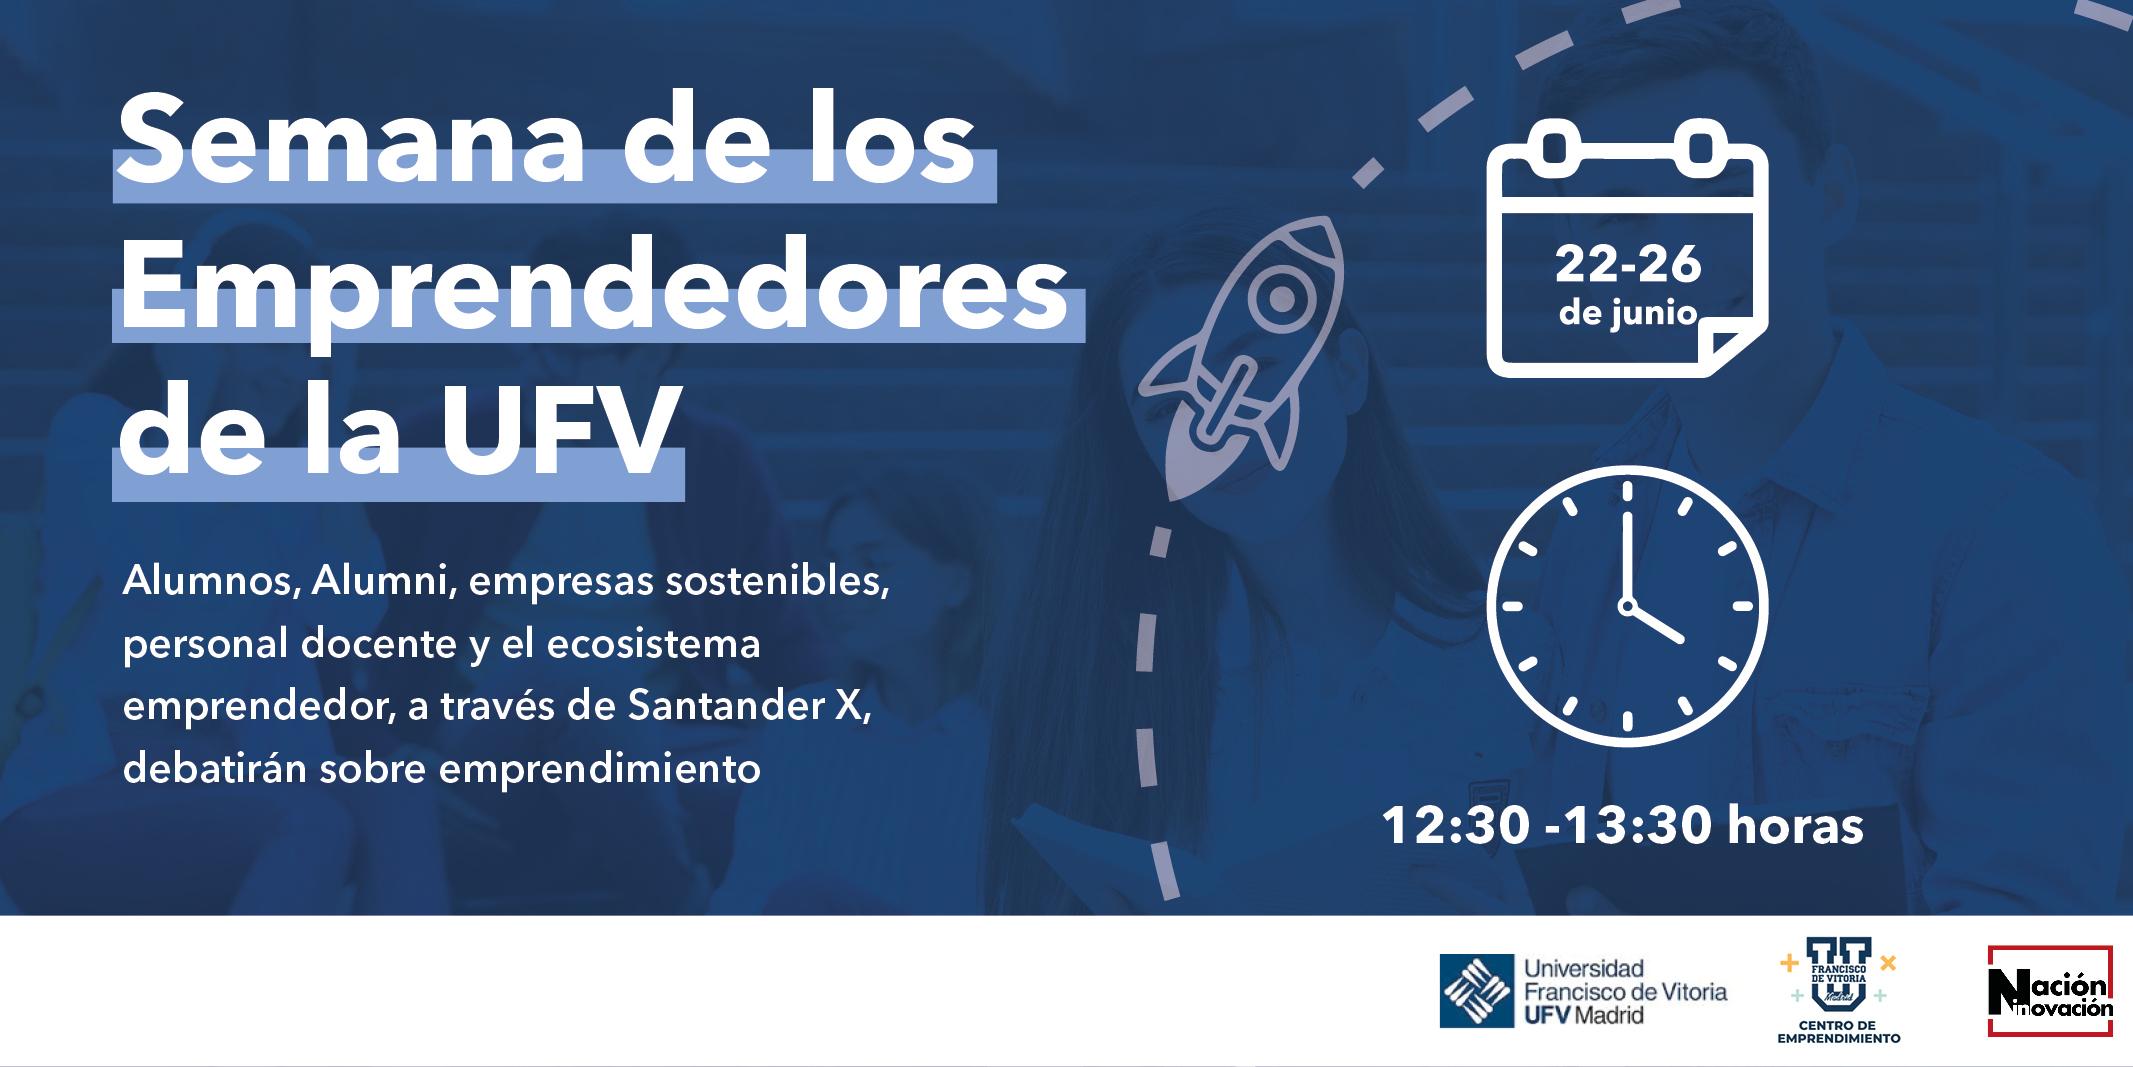 Semana de los emprendedores UFV